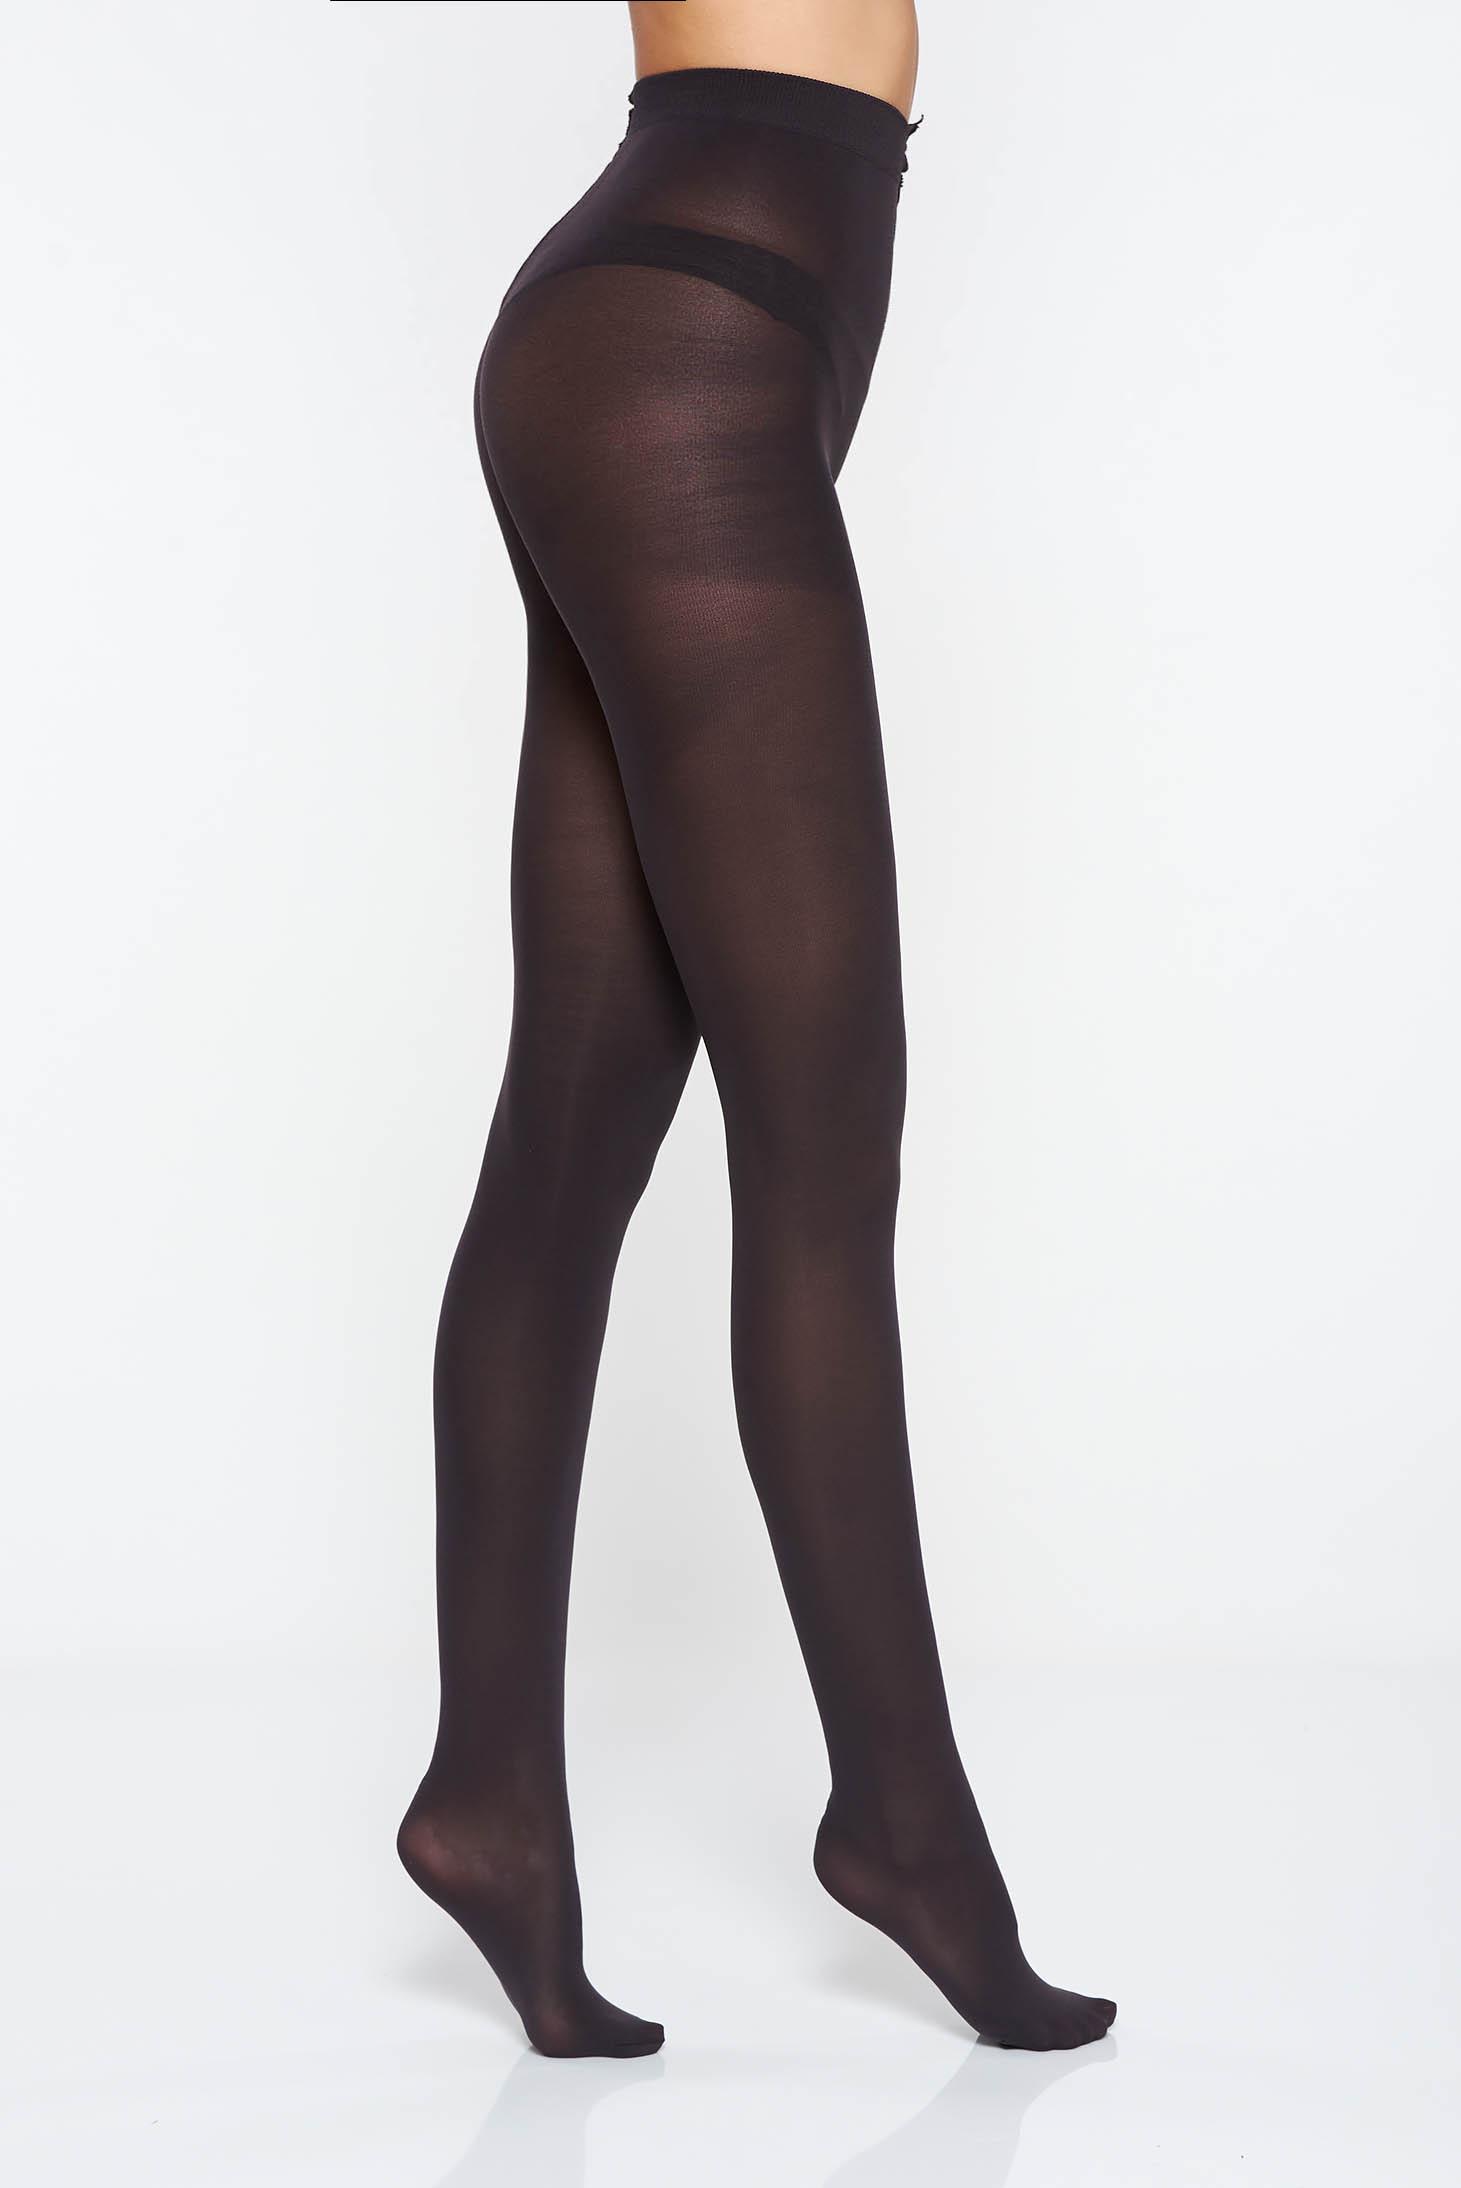 Dres dama negru mat 80 den cu banda elastica care nu aluneca